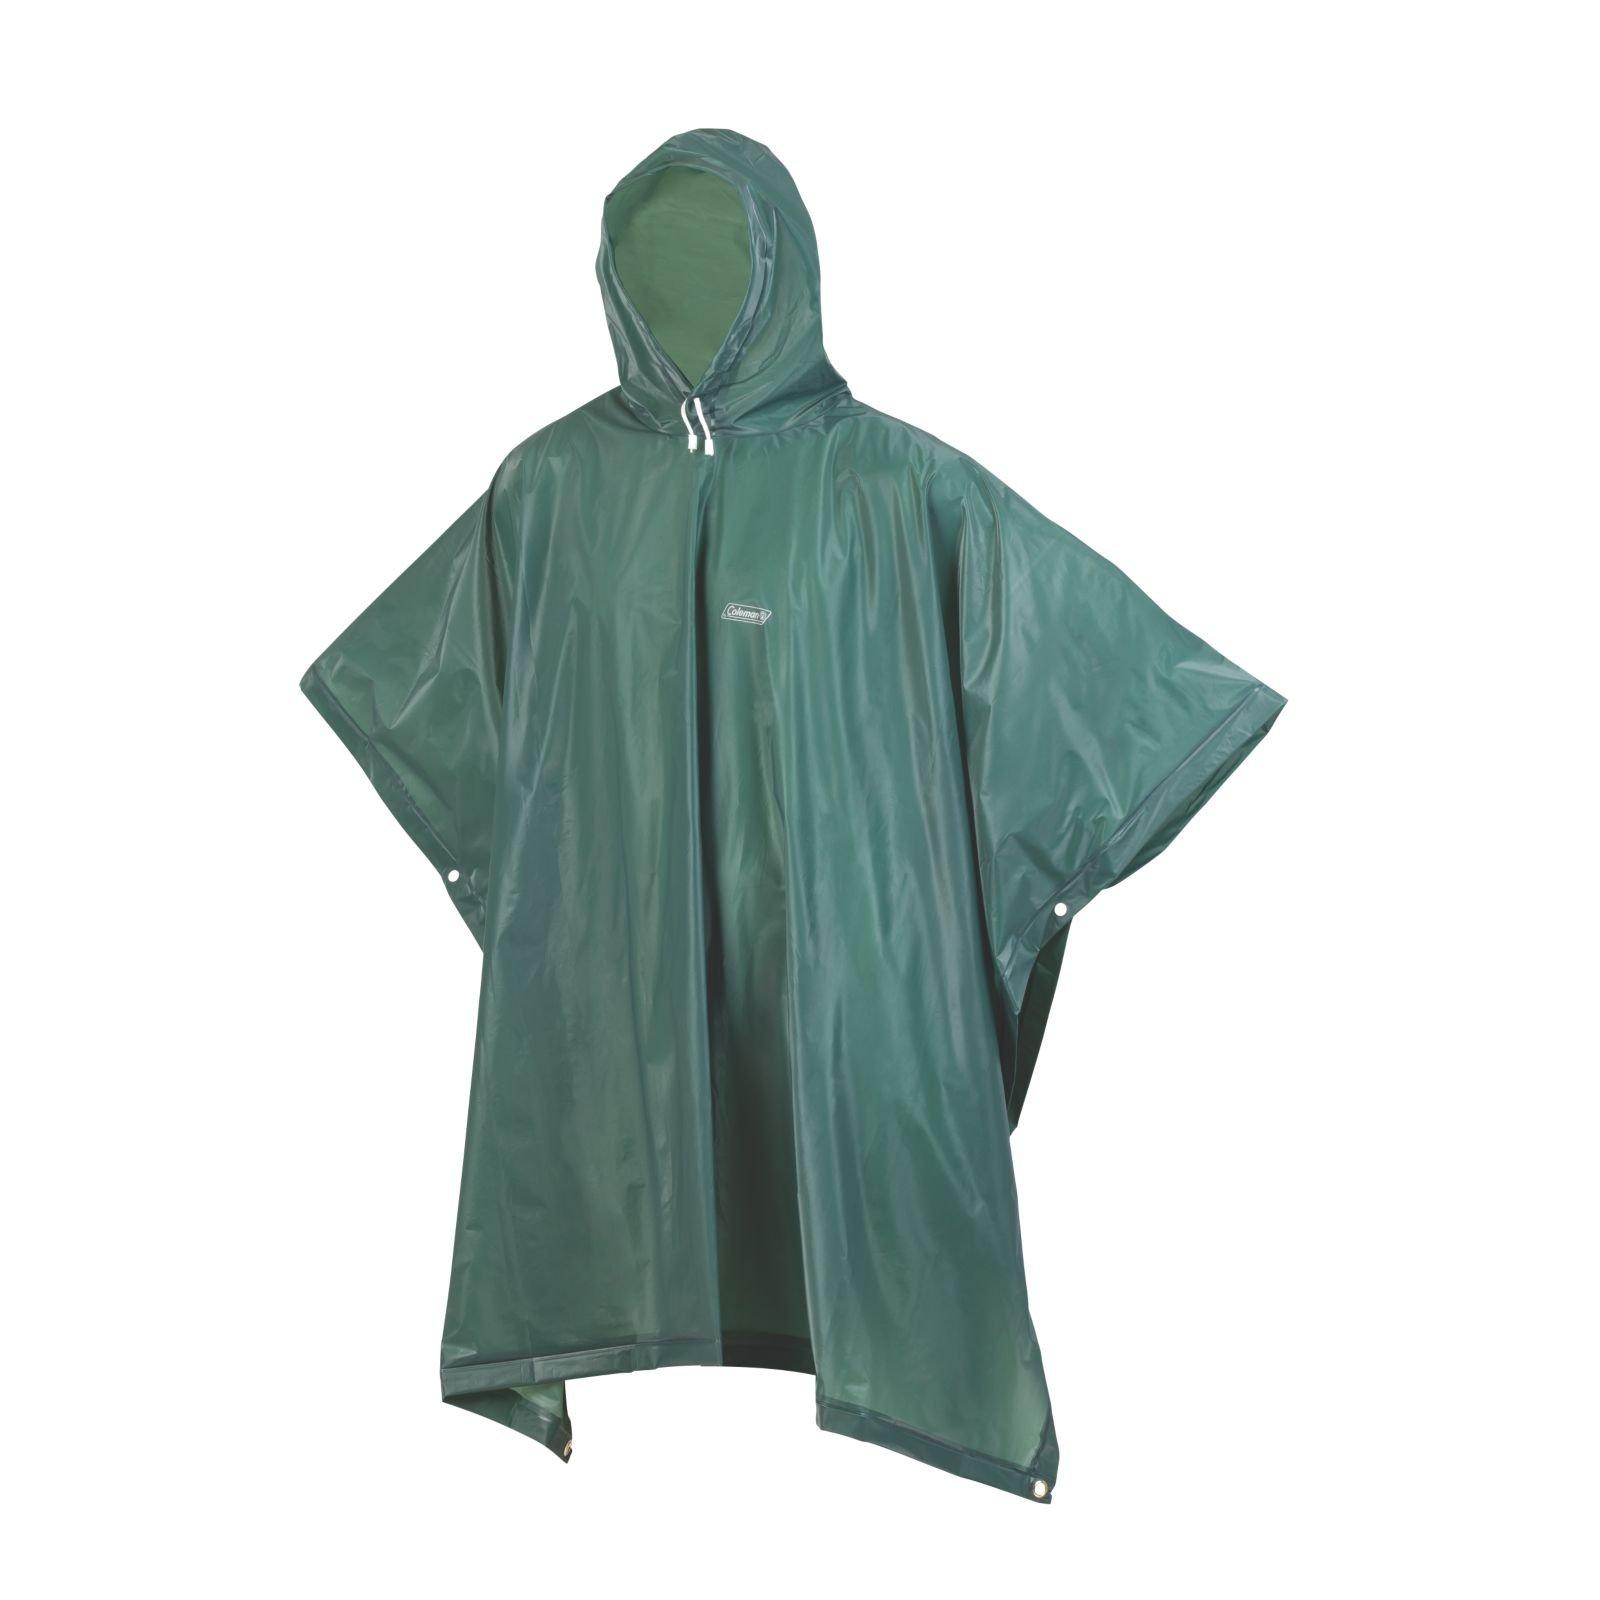 One Size Blue Coleman Rain Poncho Adult Waterproof Poncho